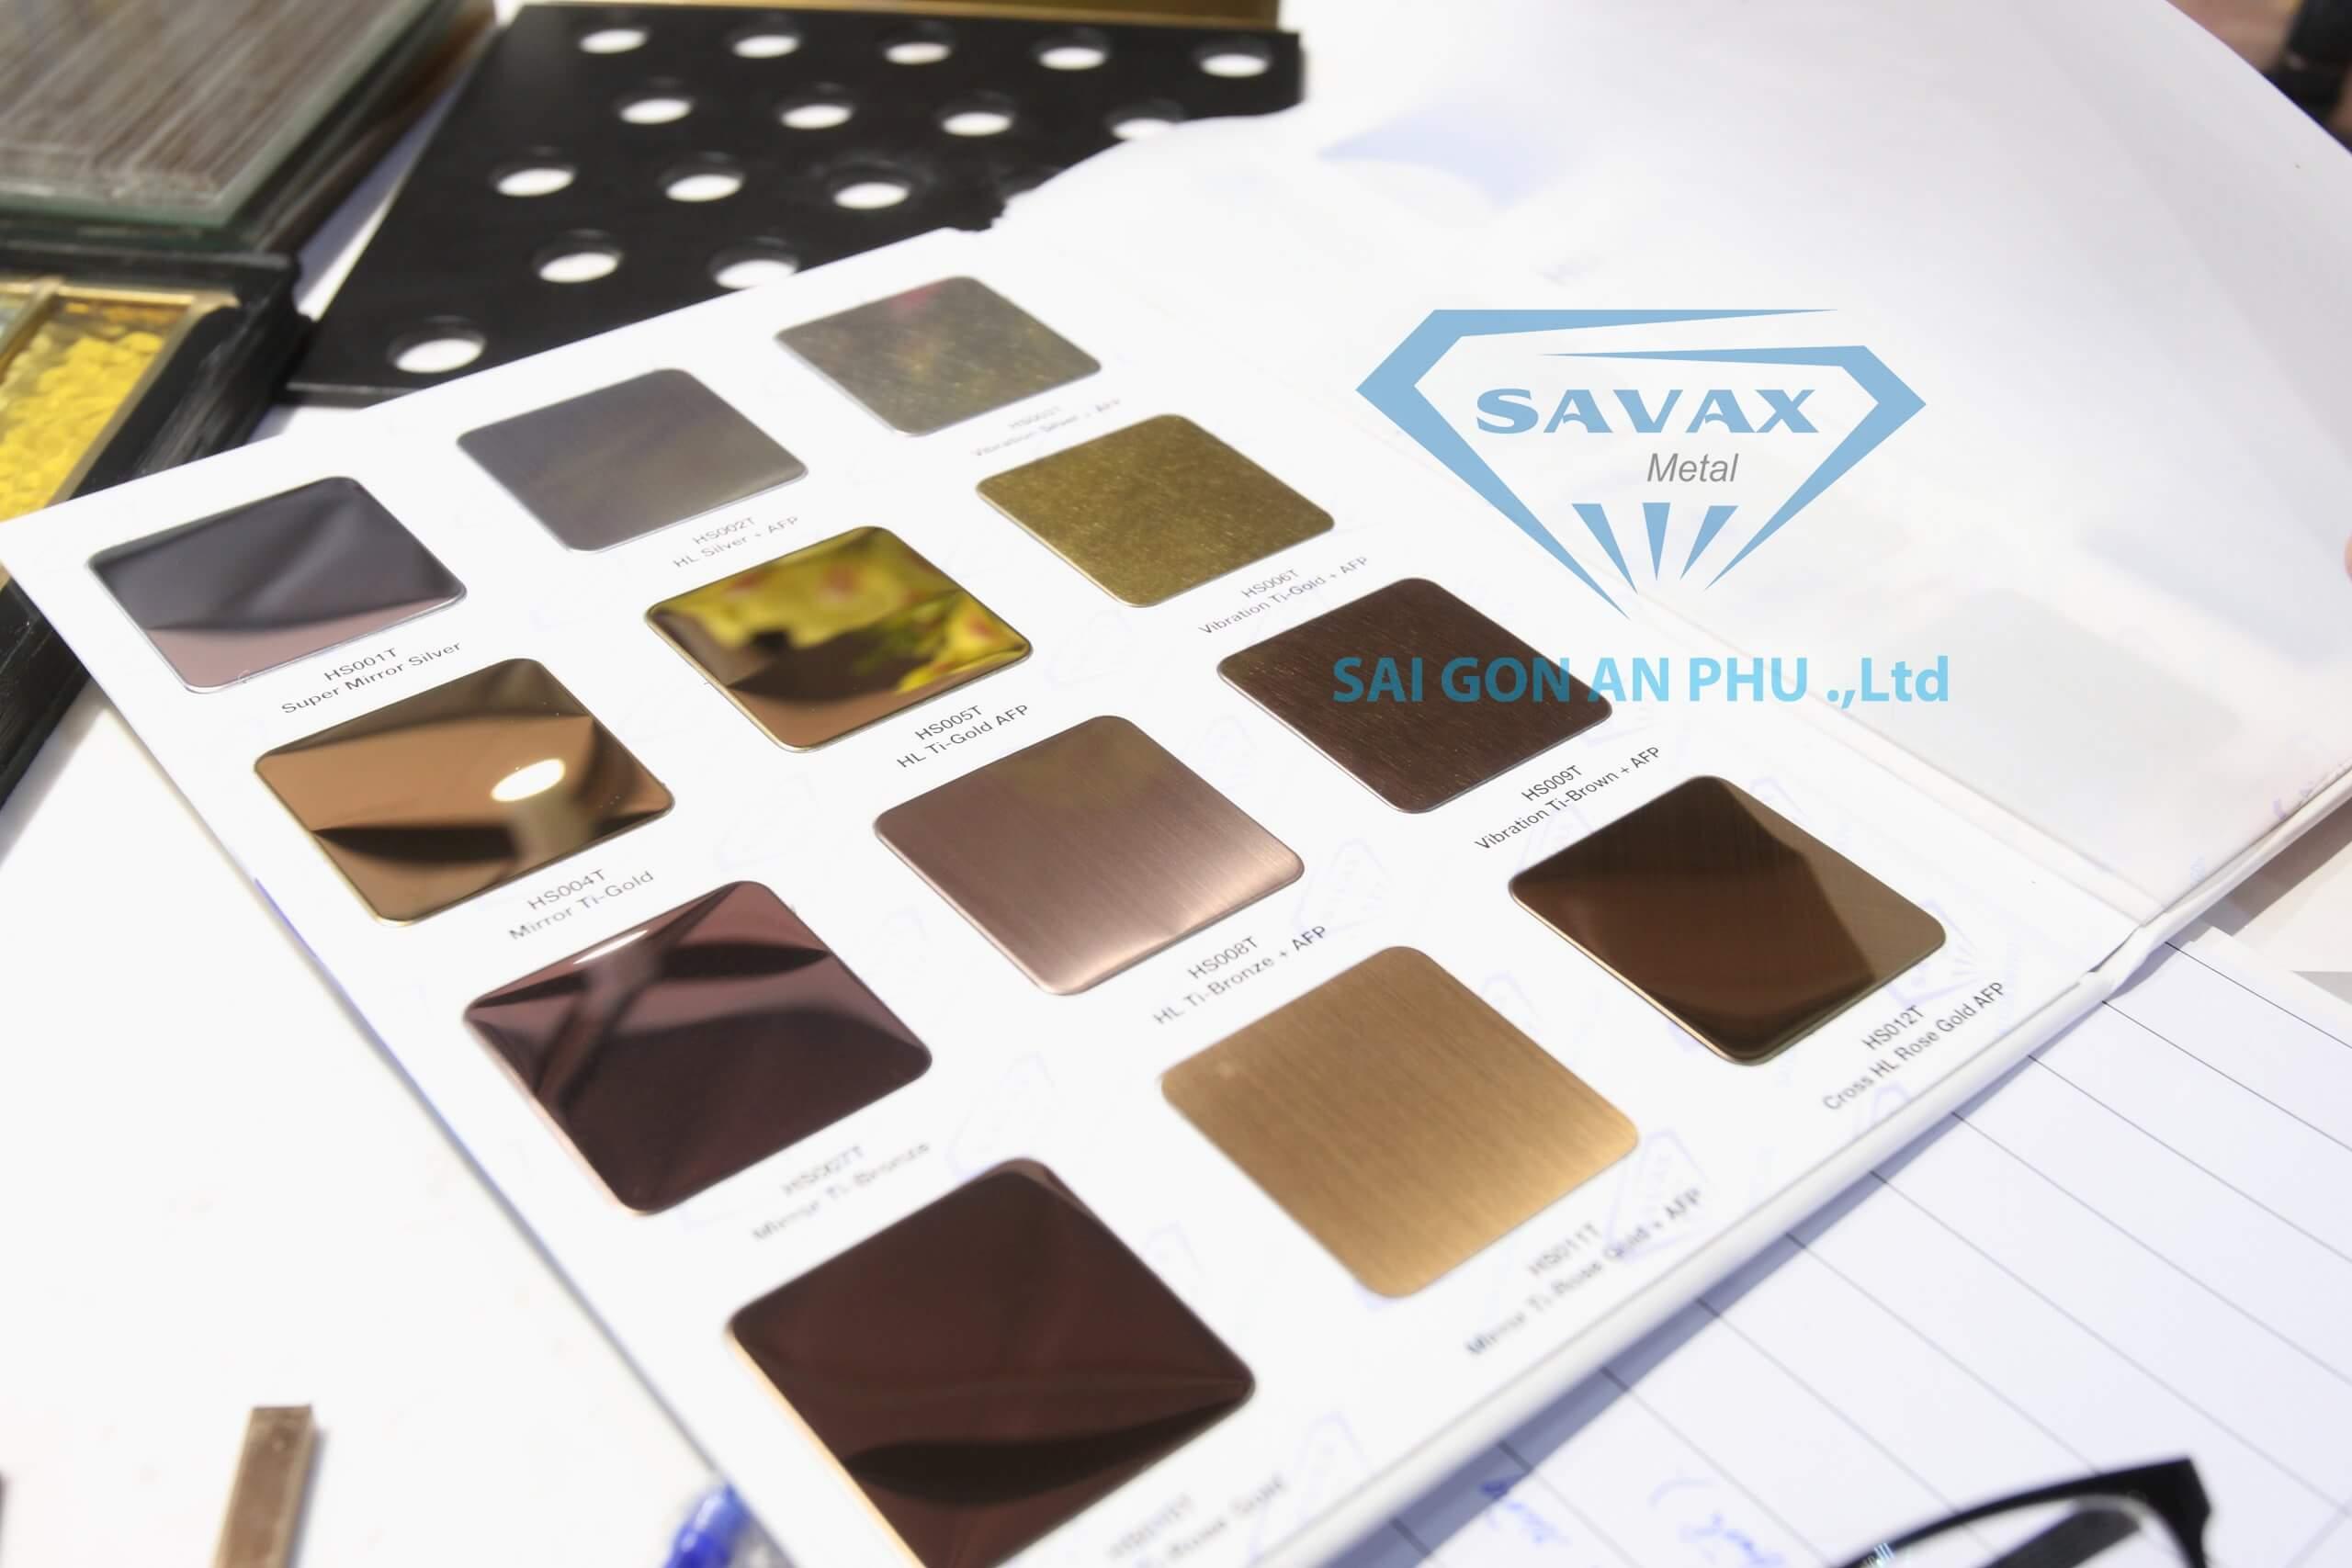 Bảng màu inox tại Savax